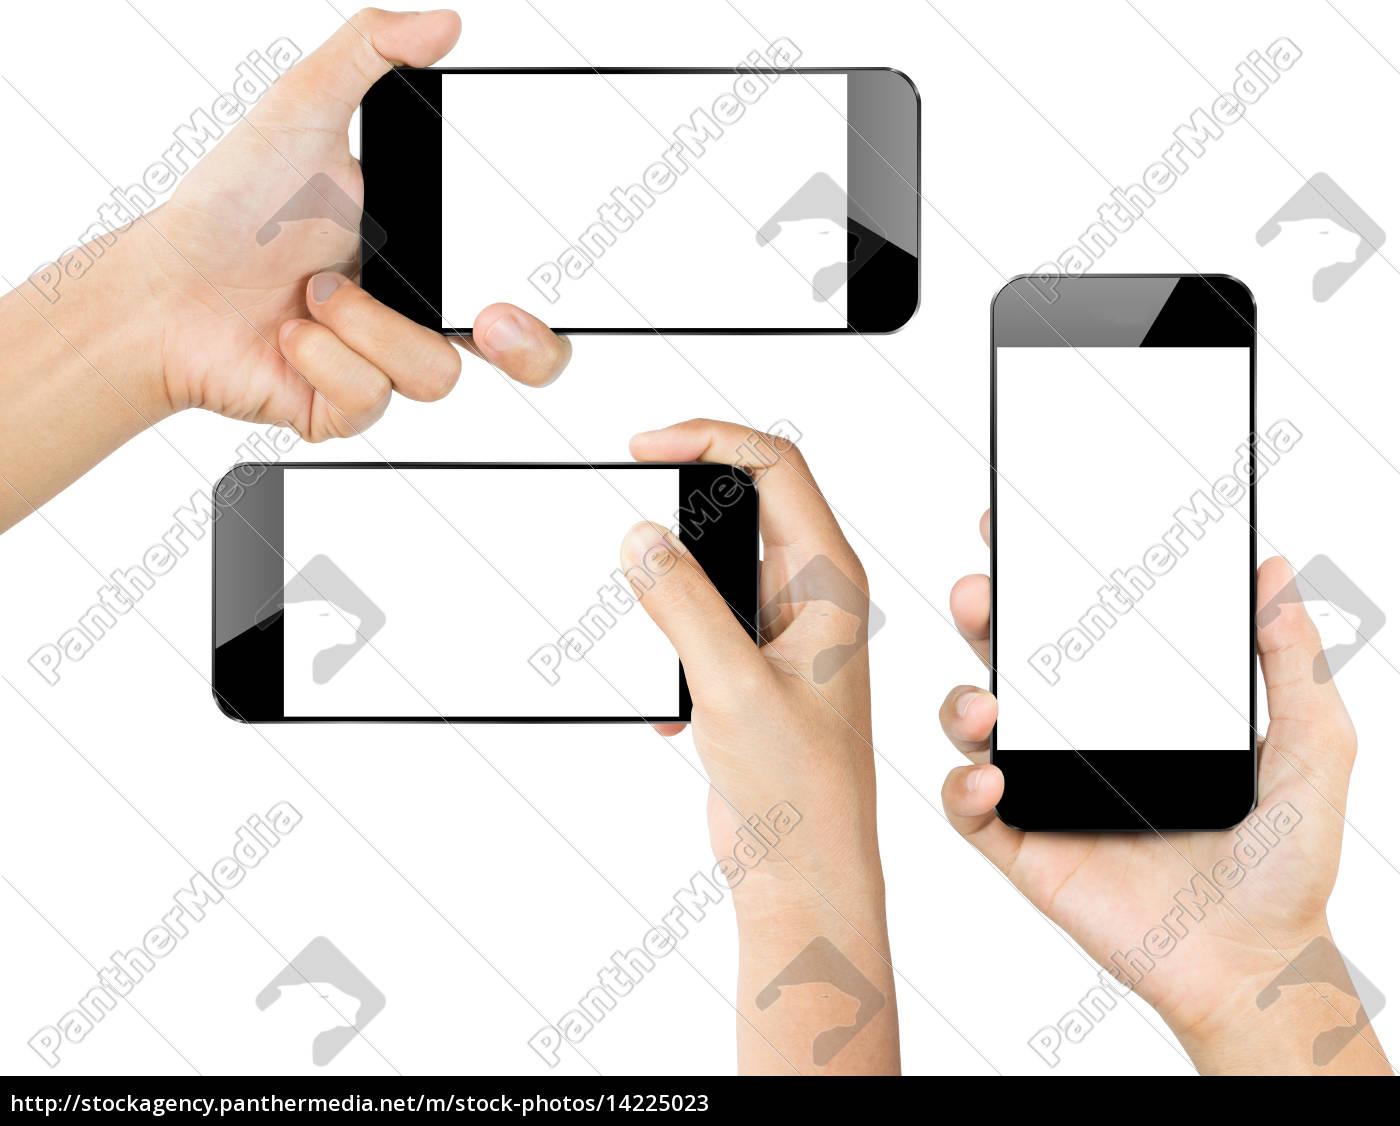 primeros, planos, mano, hold, smartphone, blanco - 14225023